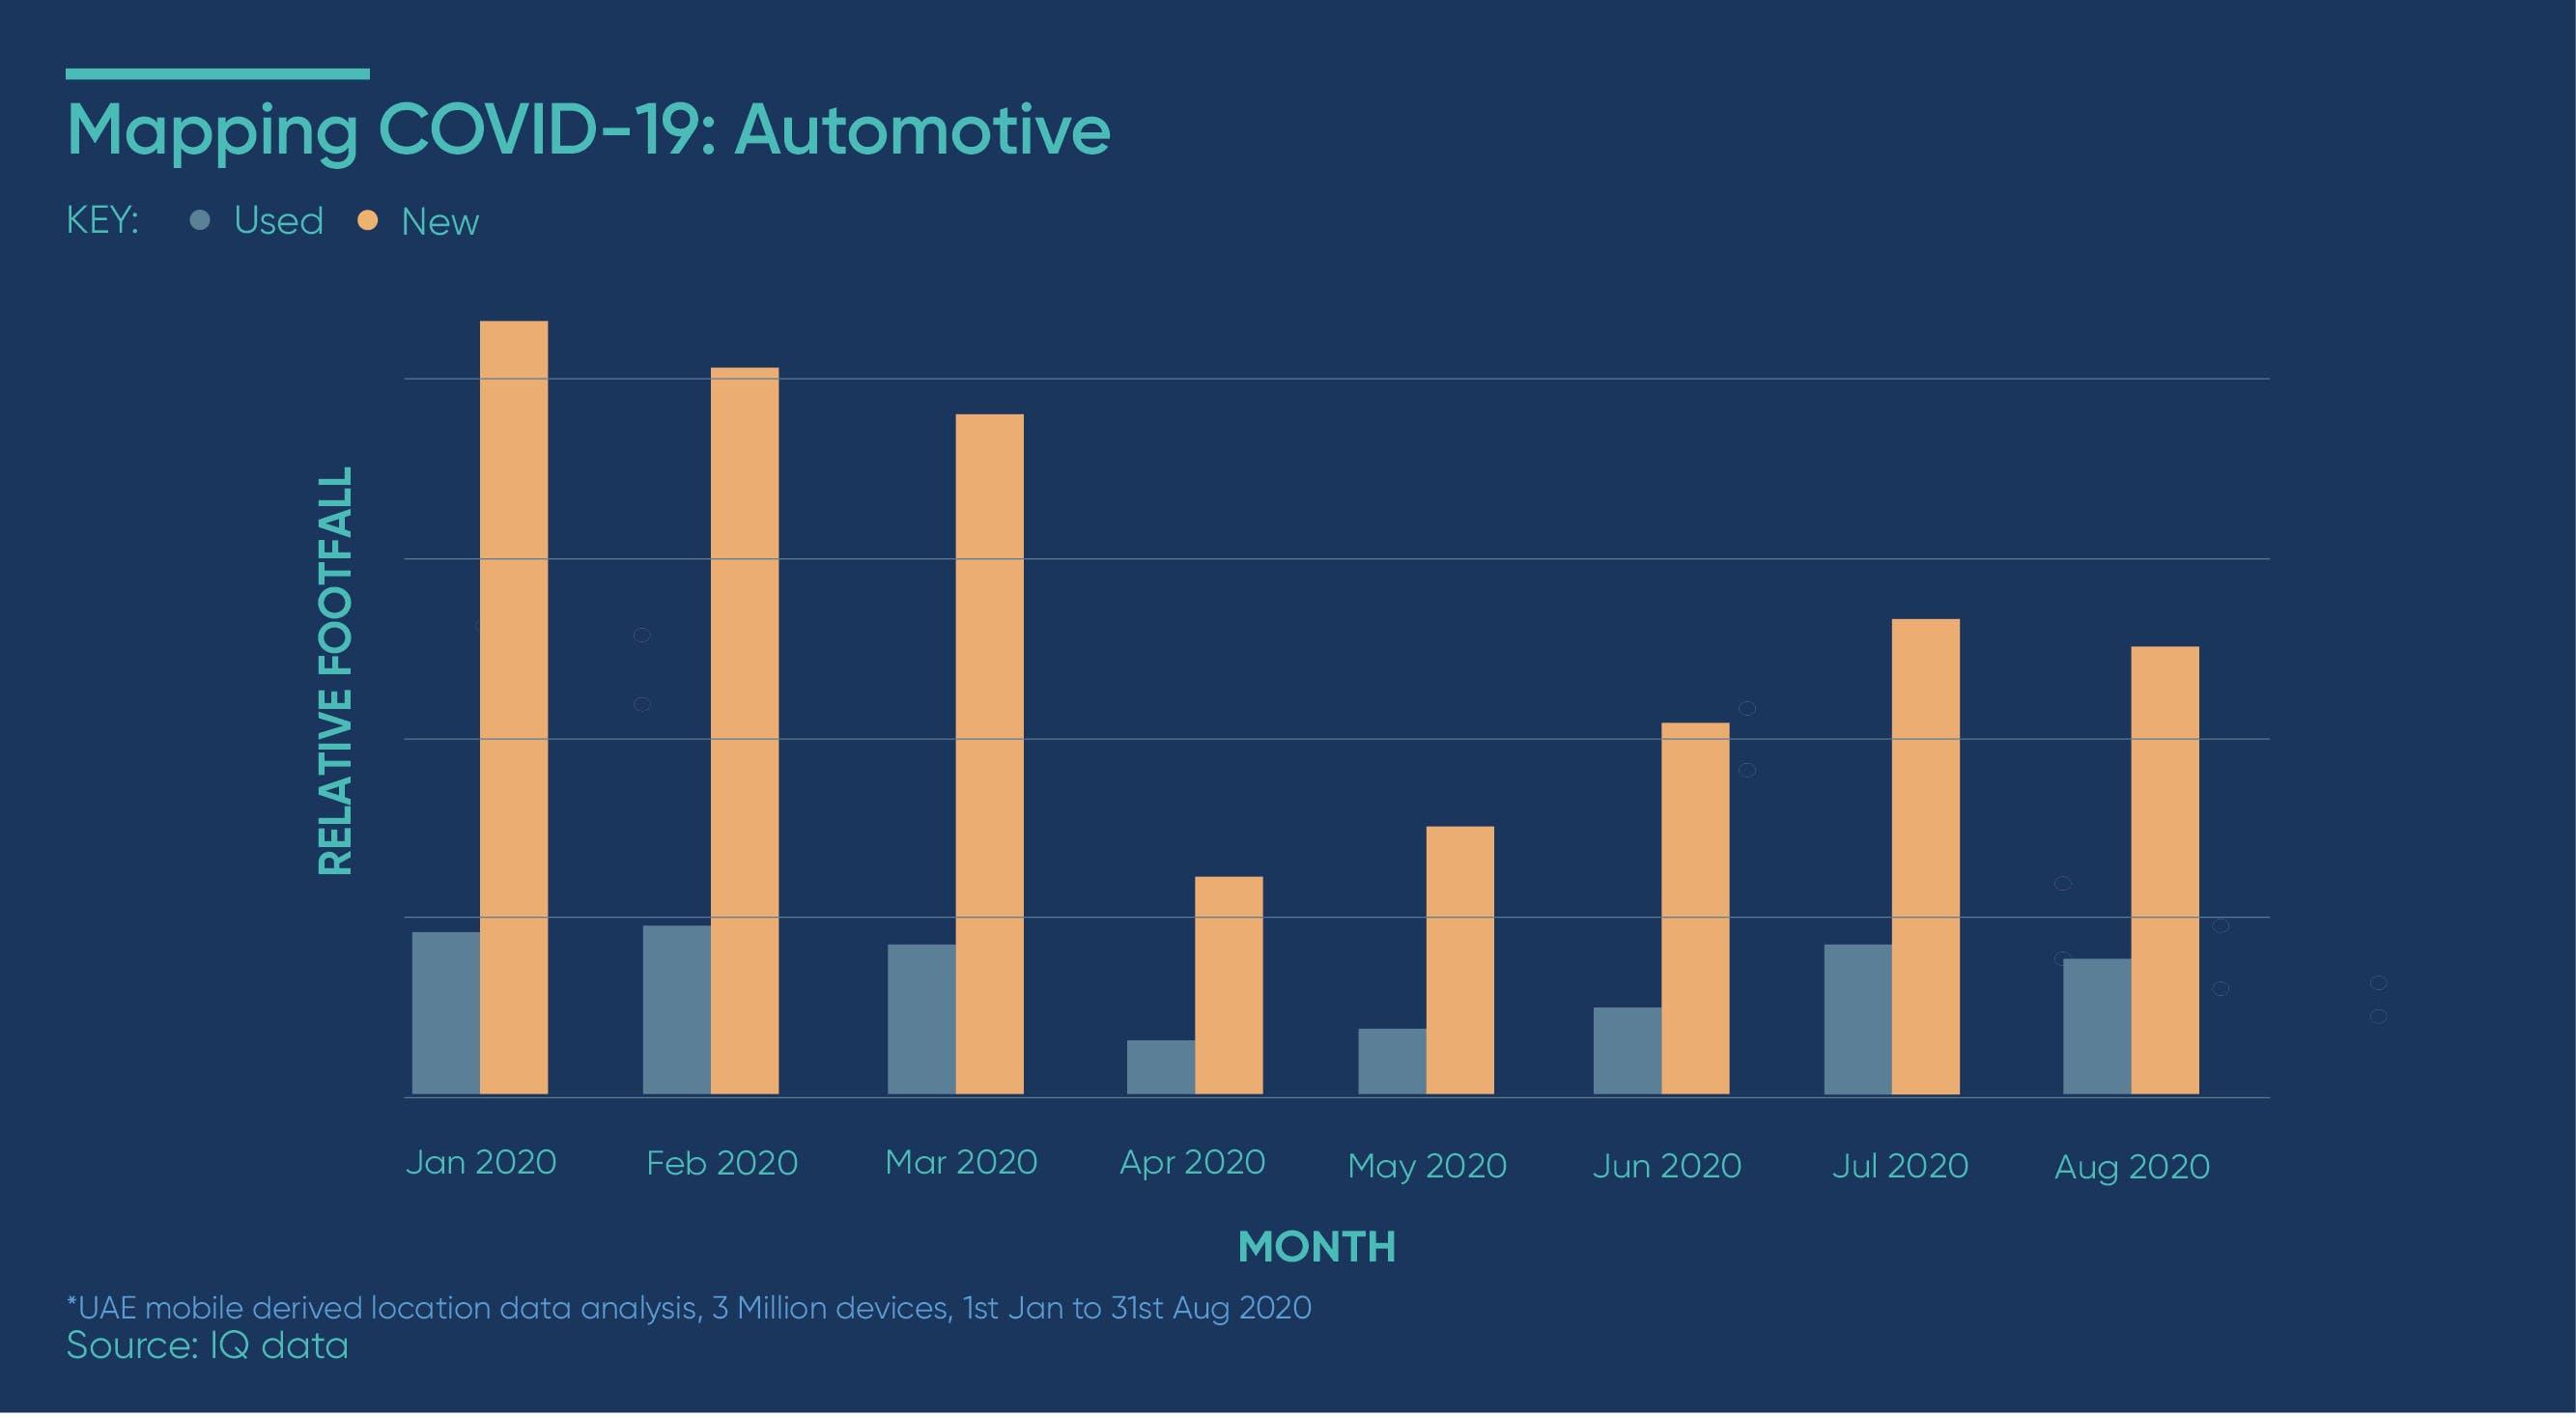 Relative footfall across used & new car showrooms - Dubai & Abu Dhabi